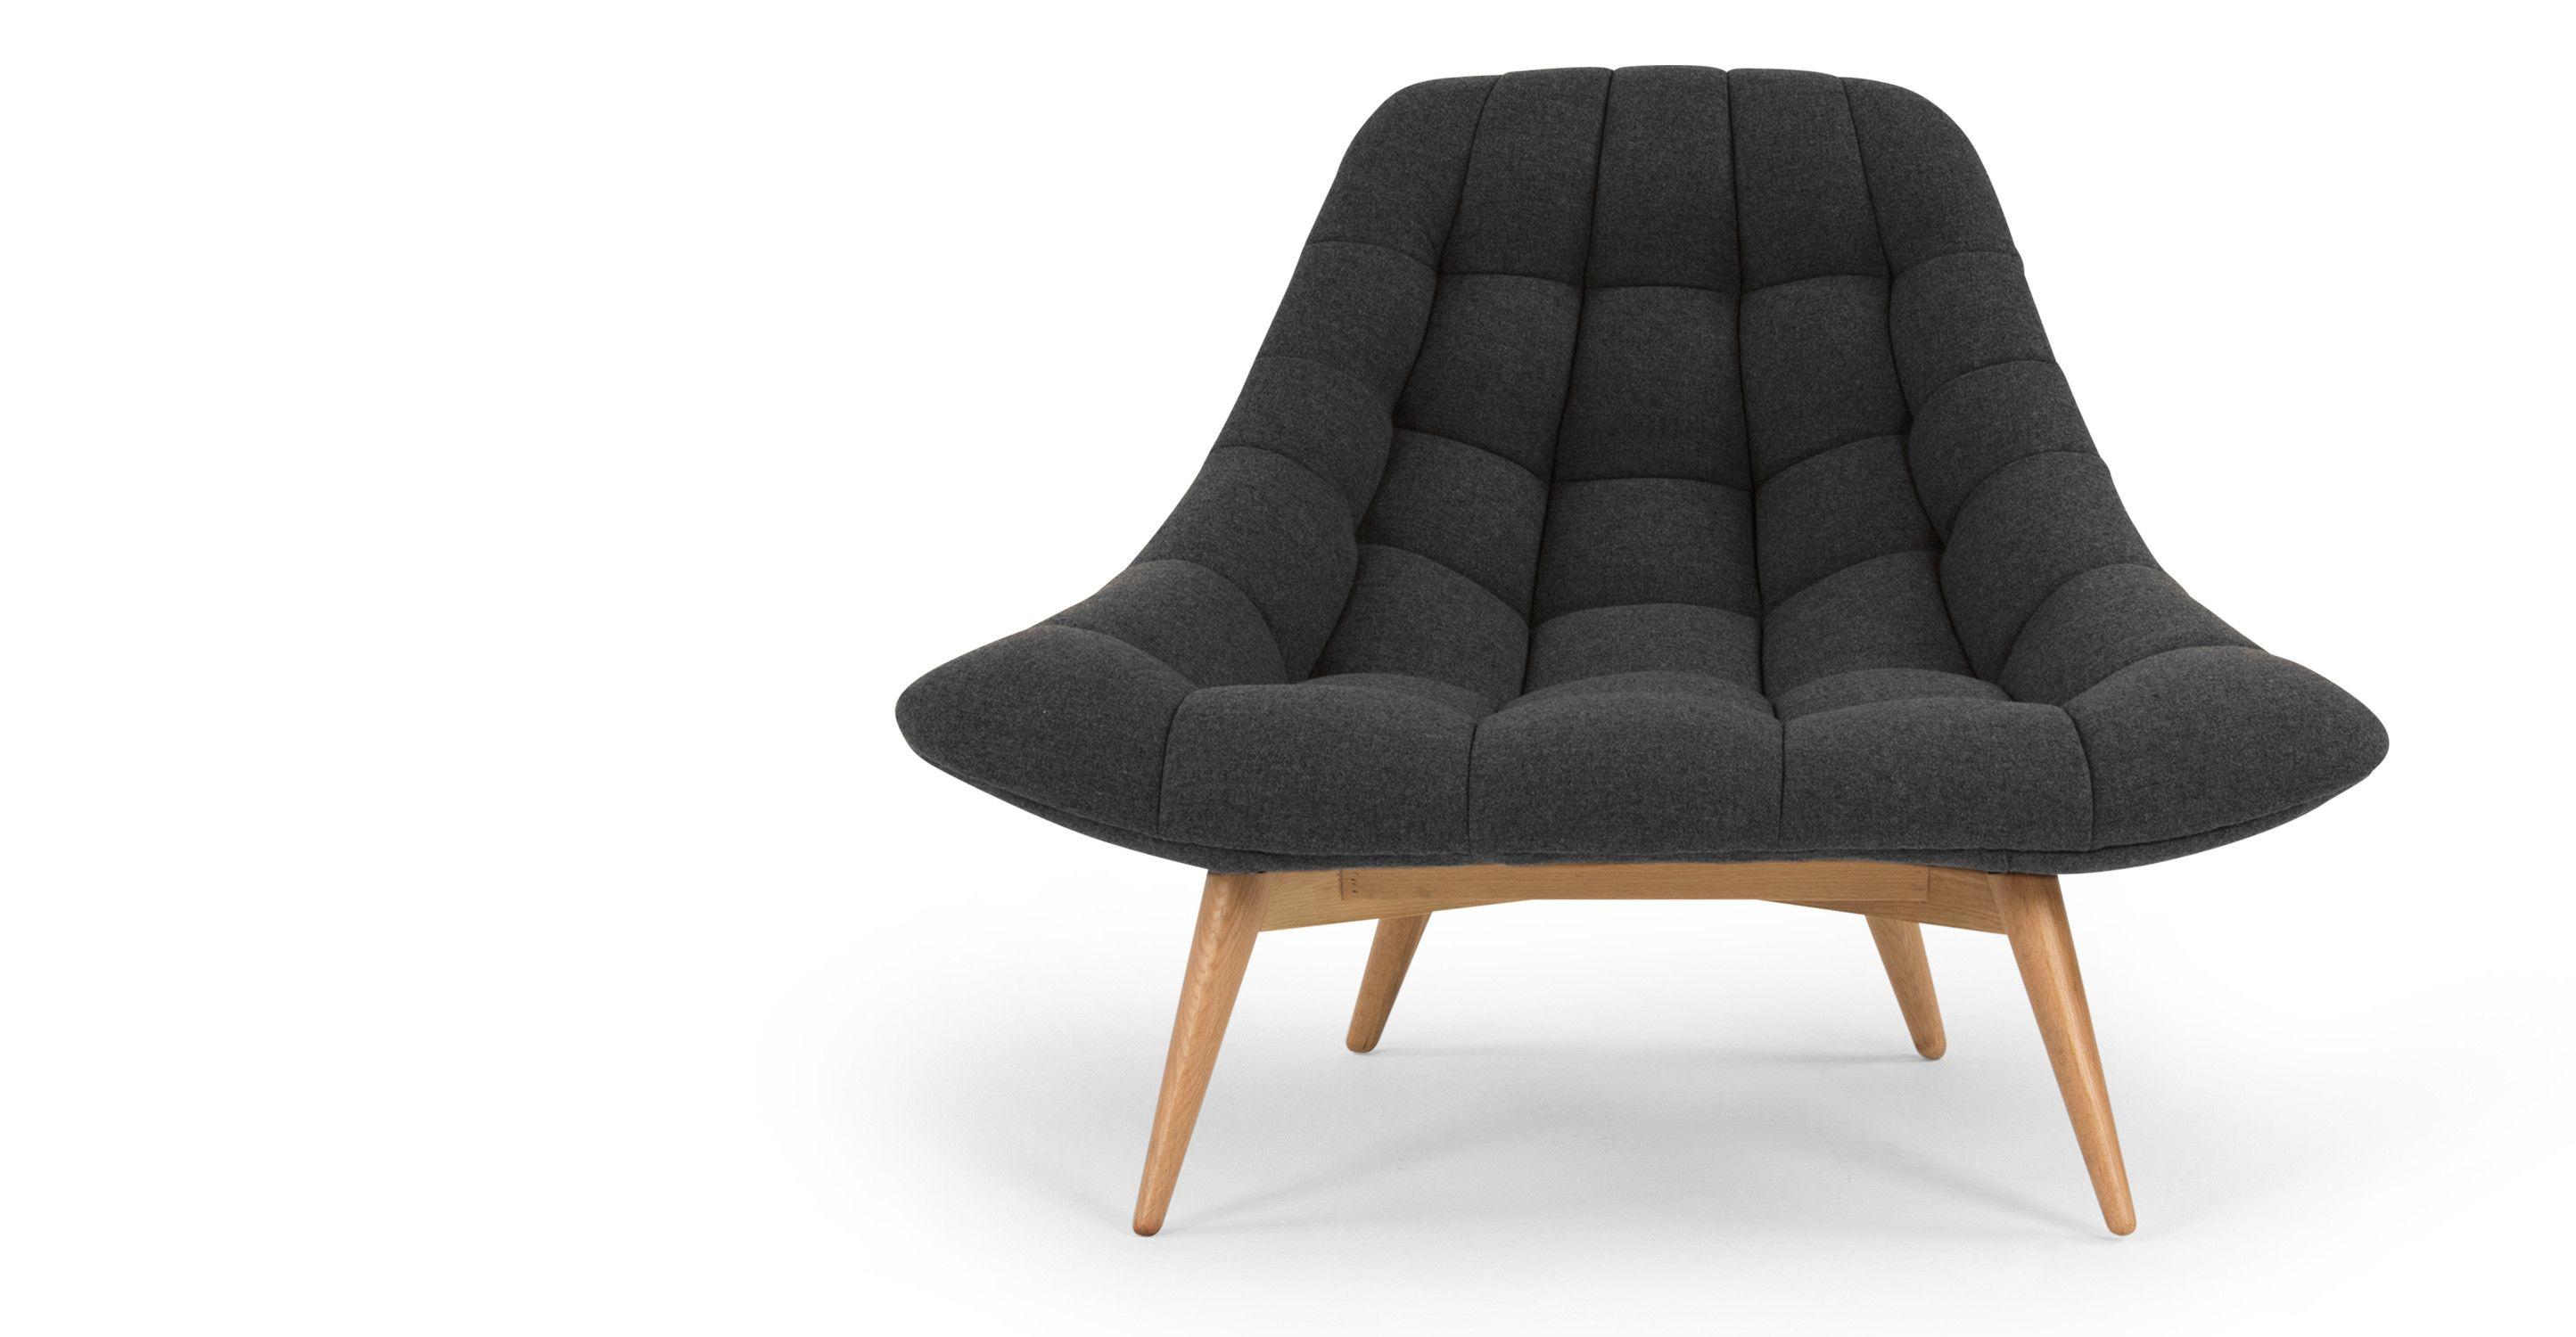 Schlafzimmer Sessel ~ Kolton loungesessel anthrazit anthrazit sessel und schlafzimmer